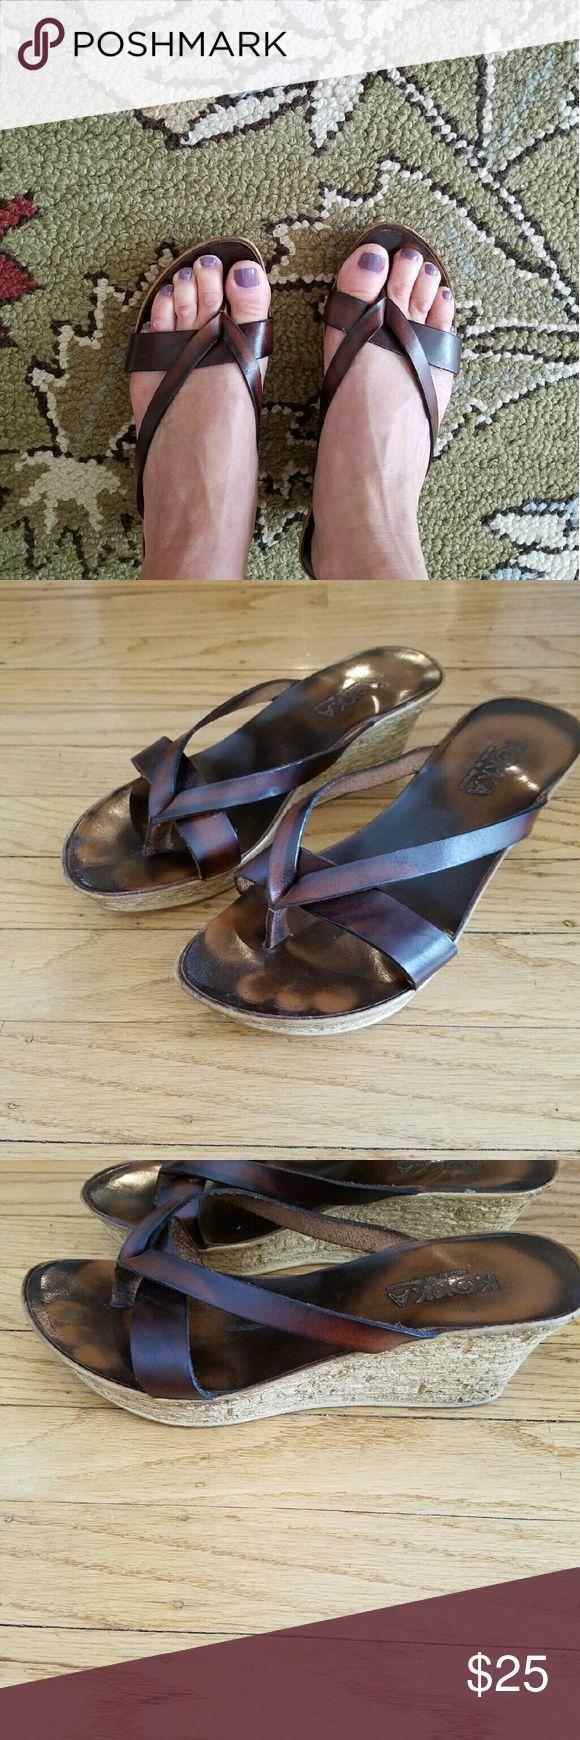 European sandals shoes - European Sandals Shoes 57